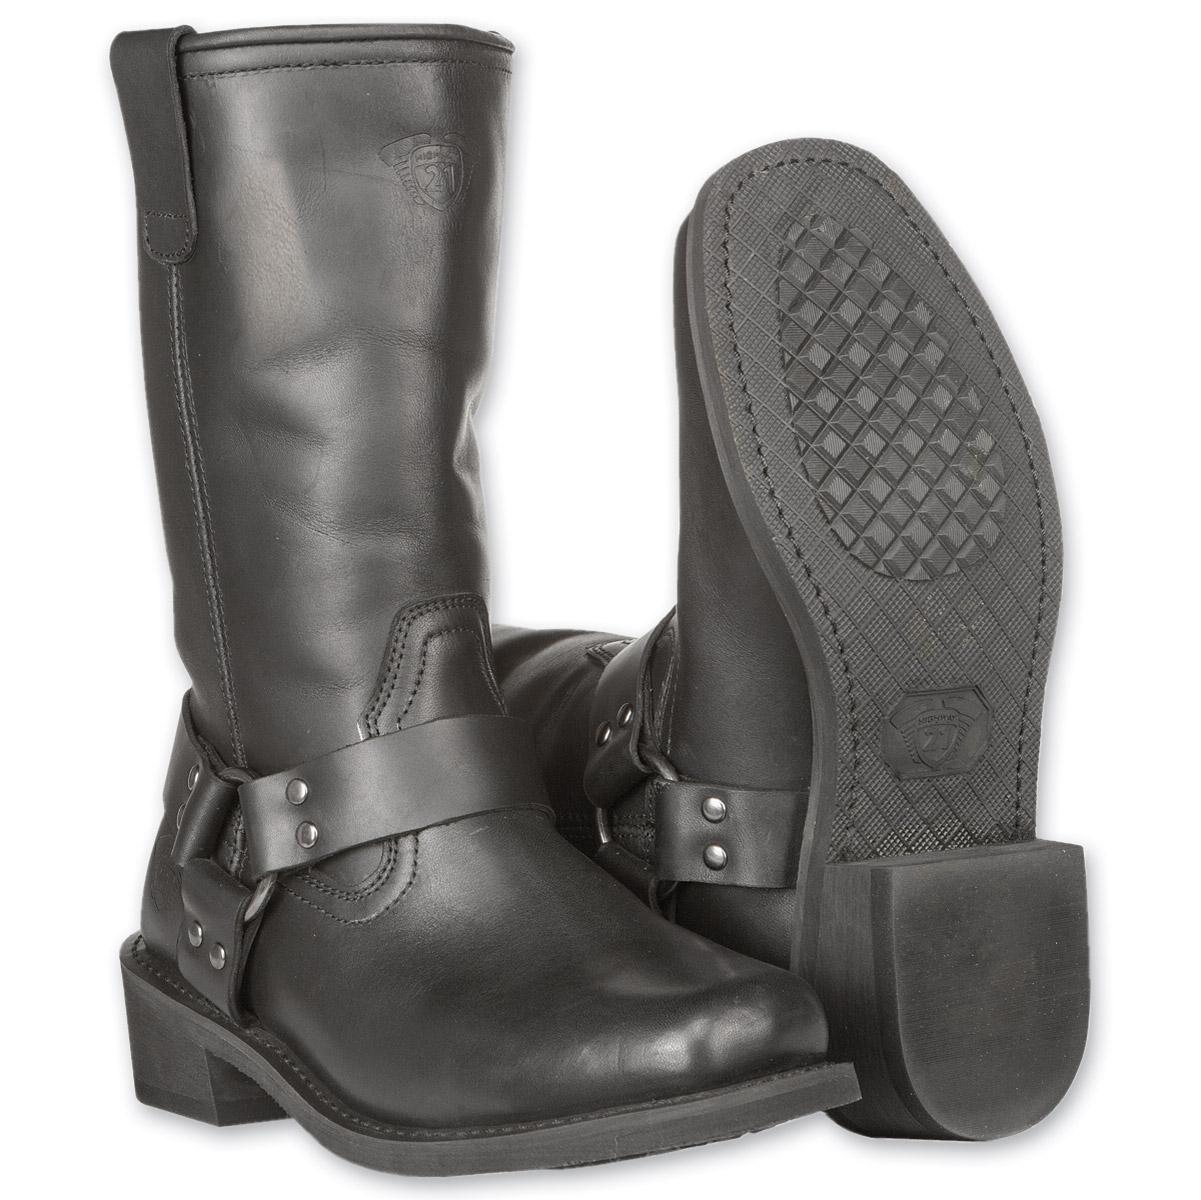 Highway 21 Men's Spark Harness Black Boots